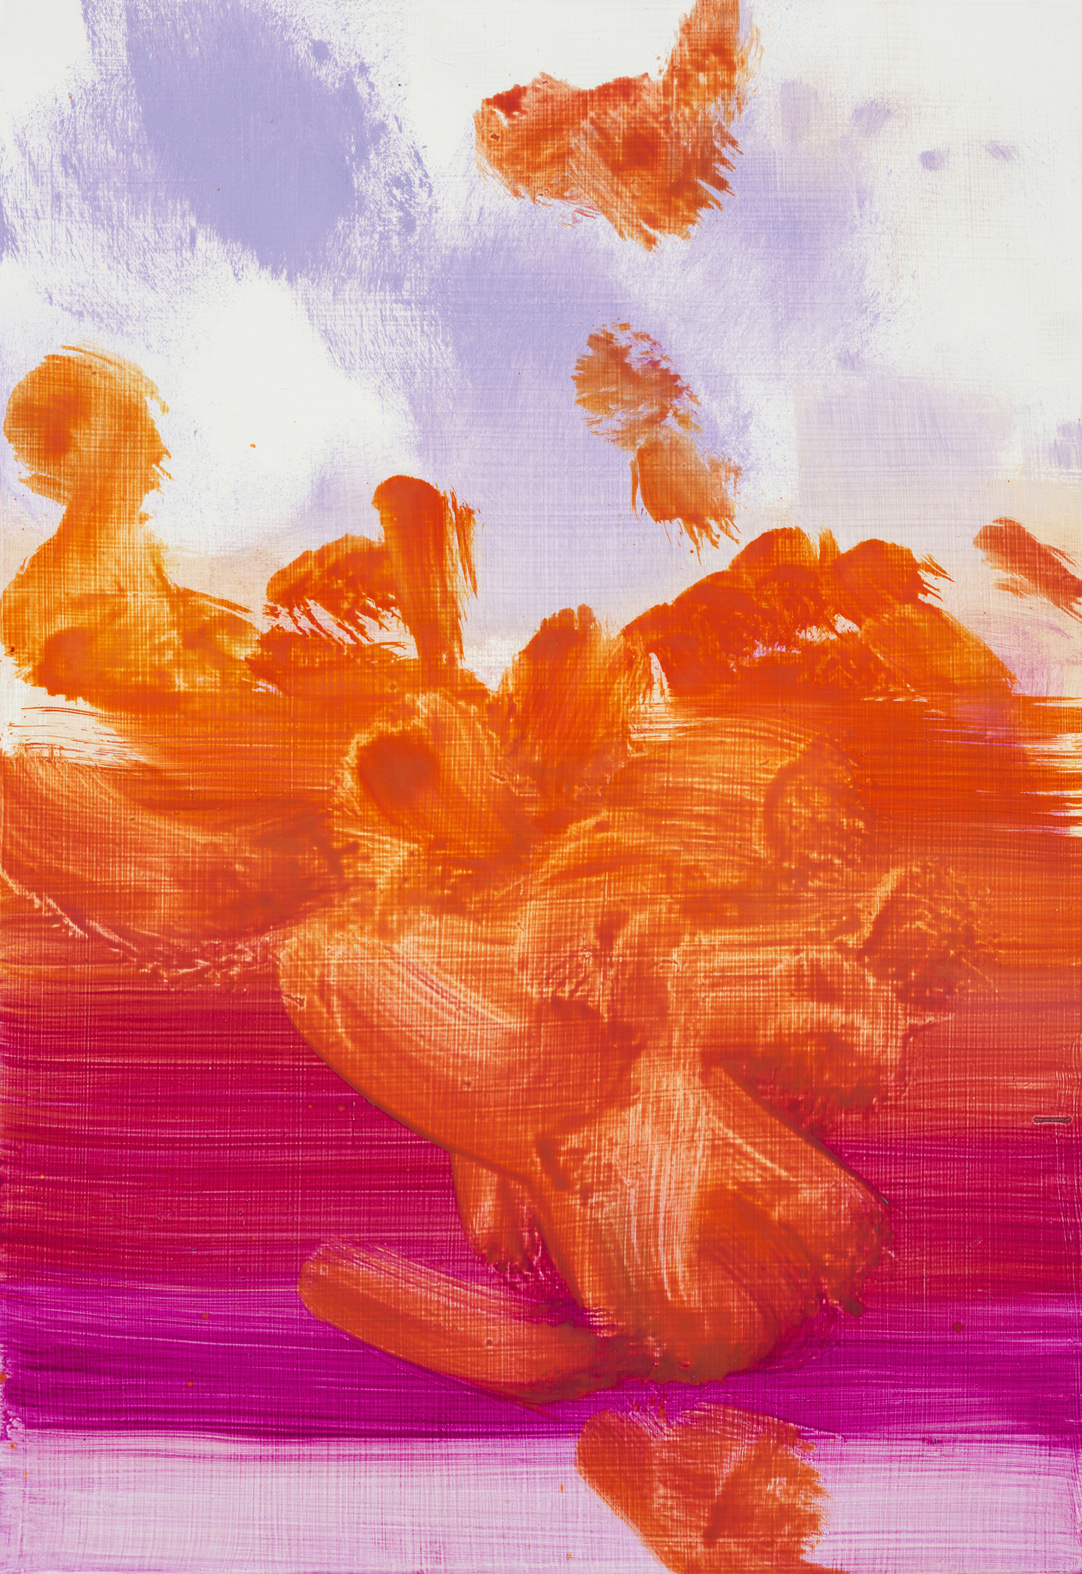 Untitled  (pink orange)  2017  Oil on panel  32 x 22cm